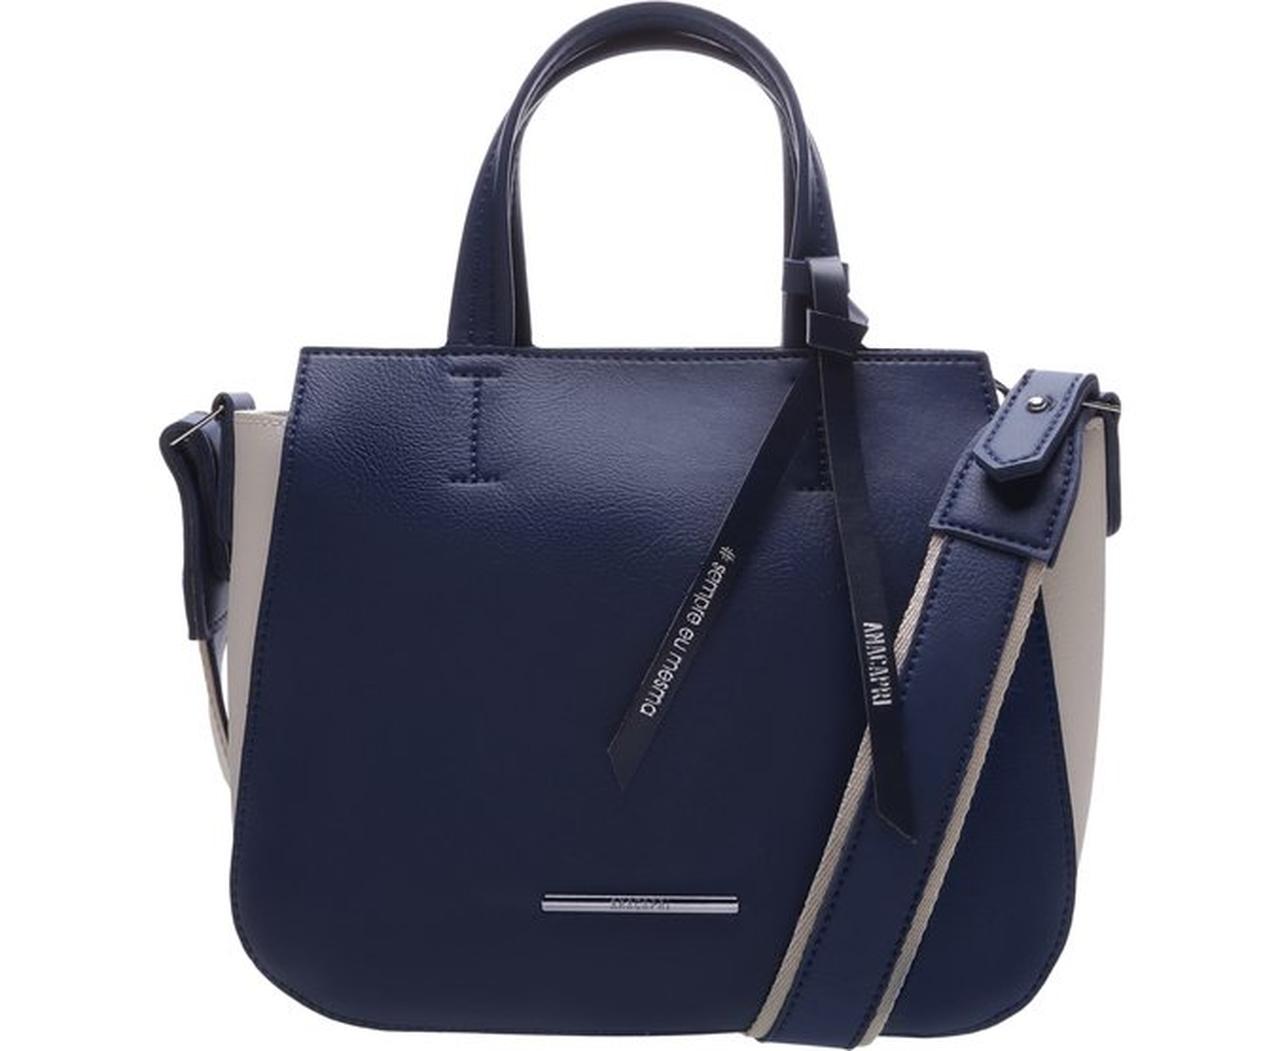 Bolsa Tote Azul e Off-White - AnaCapri